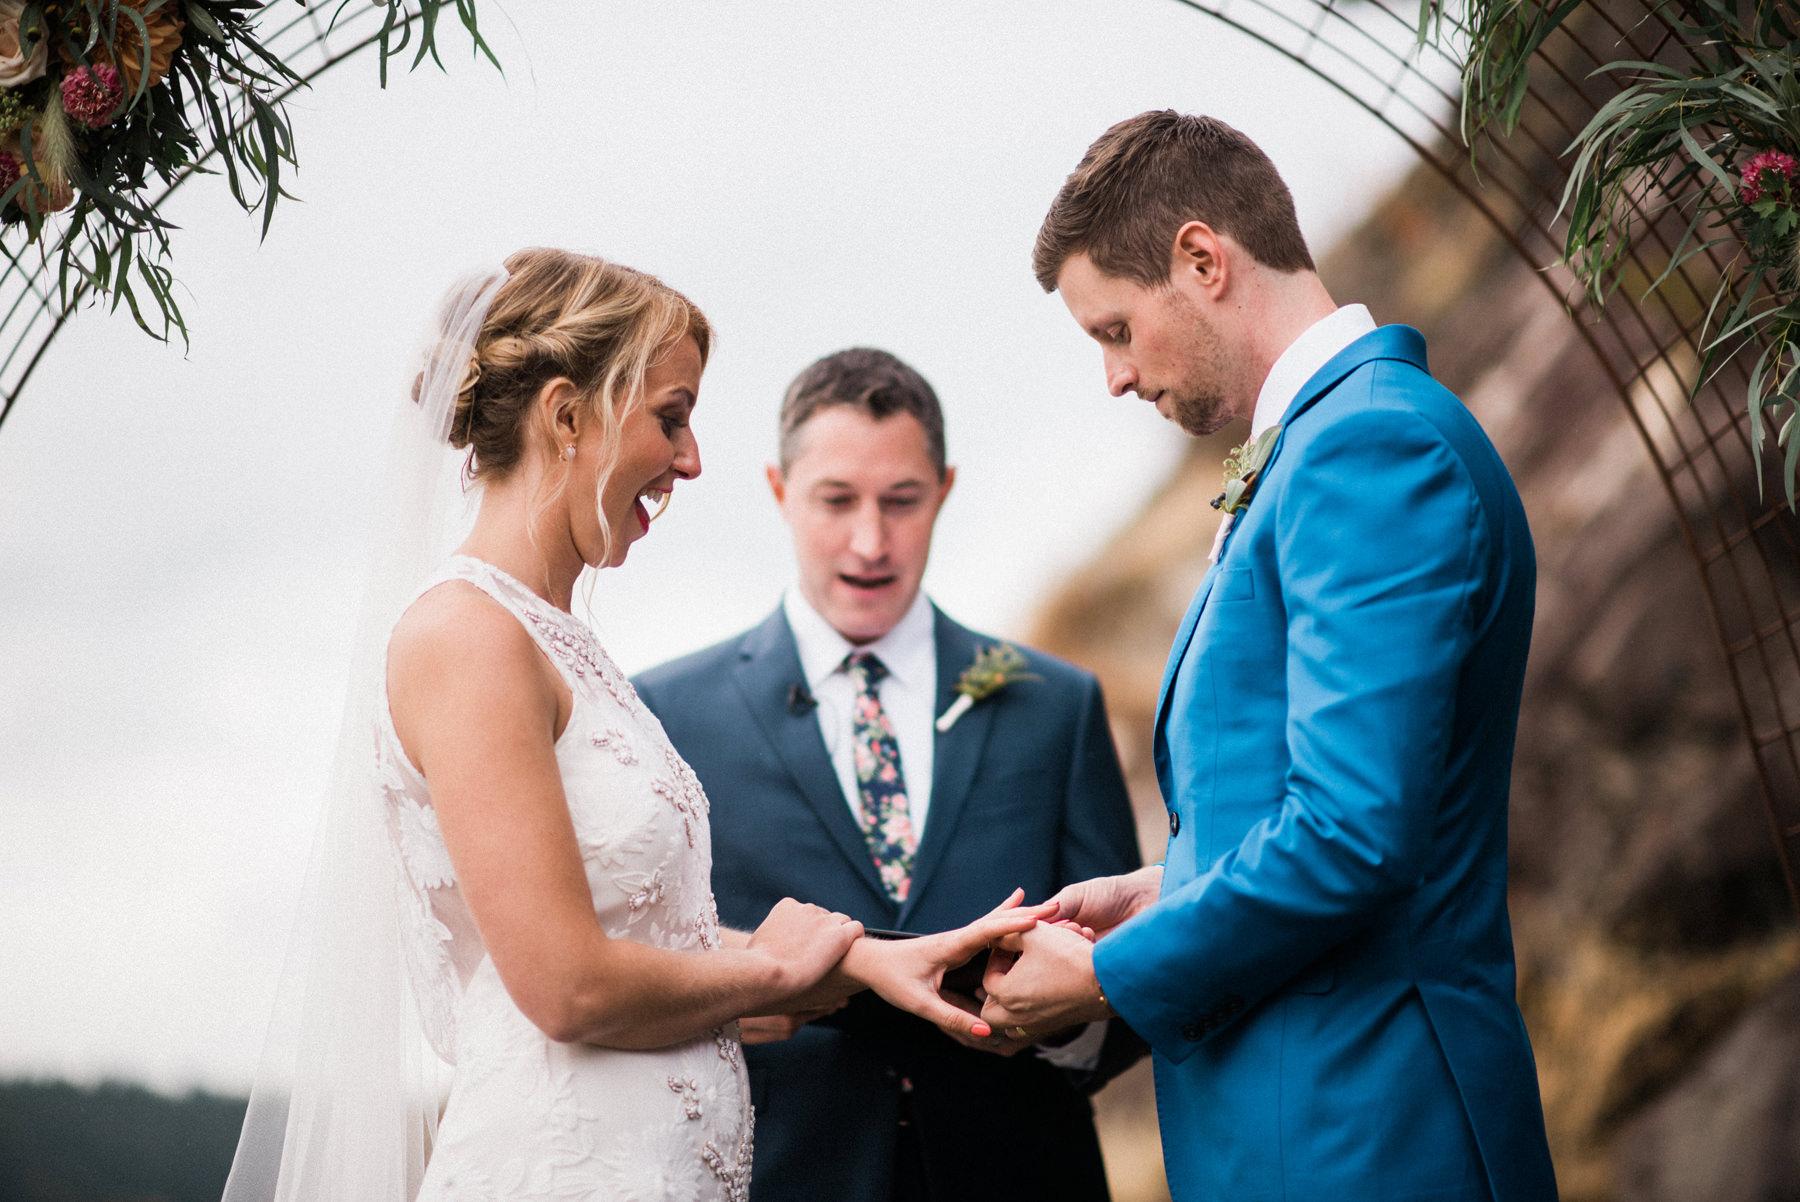 330-colorful-outdoor-lopez-island-wedding.jpg